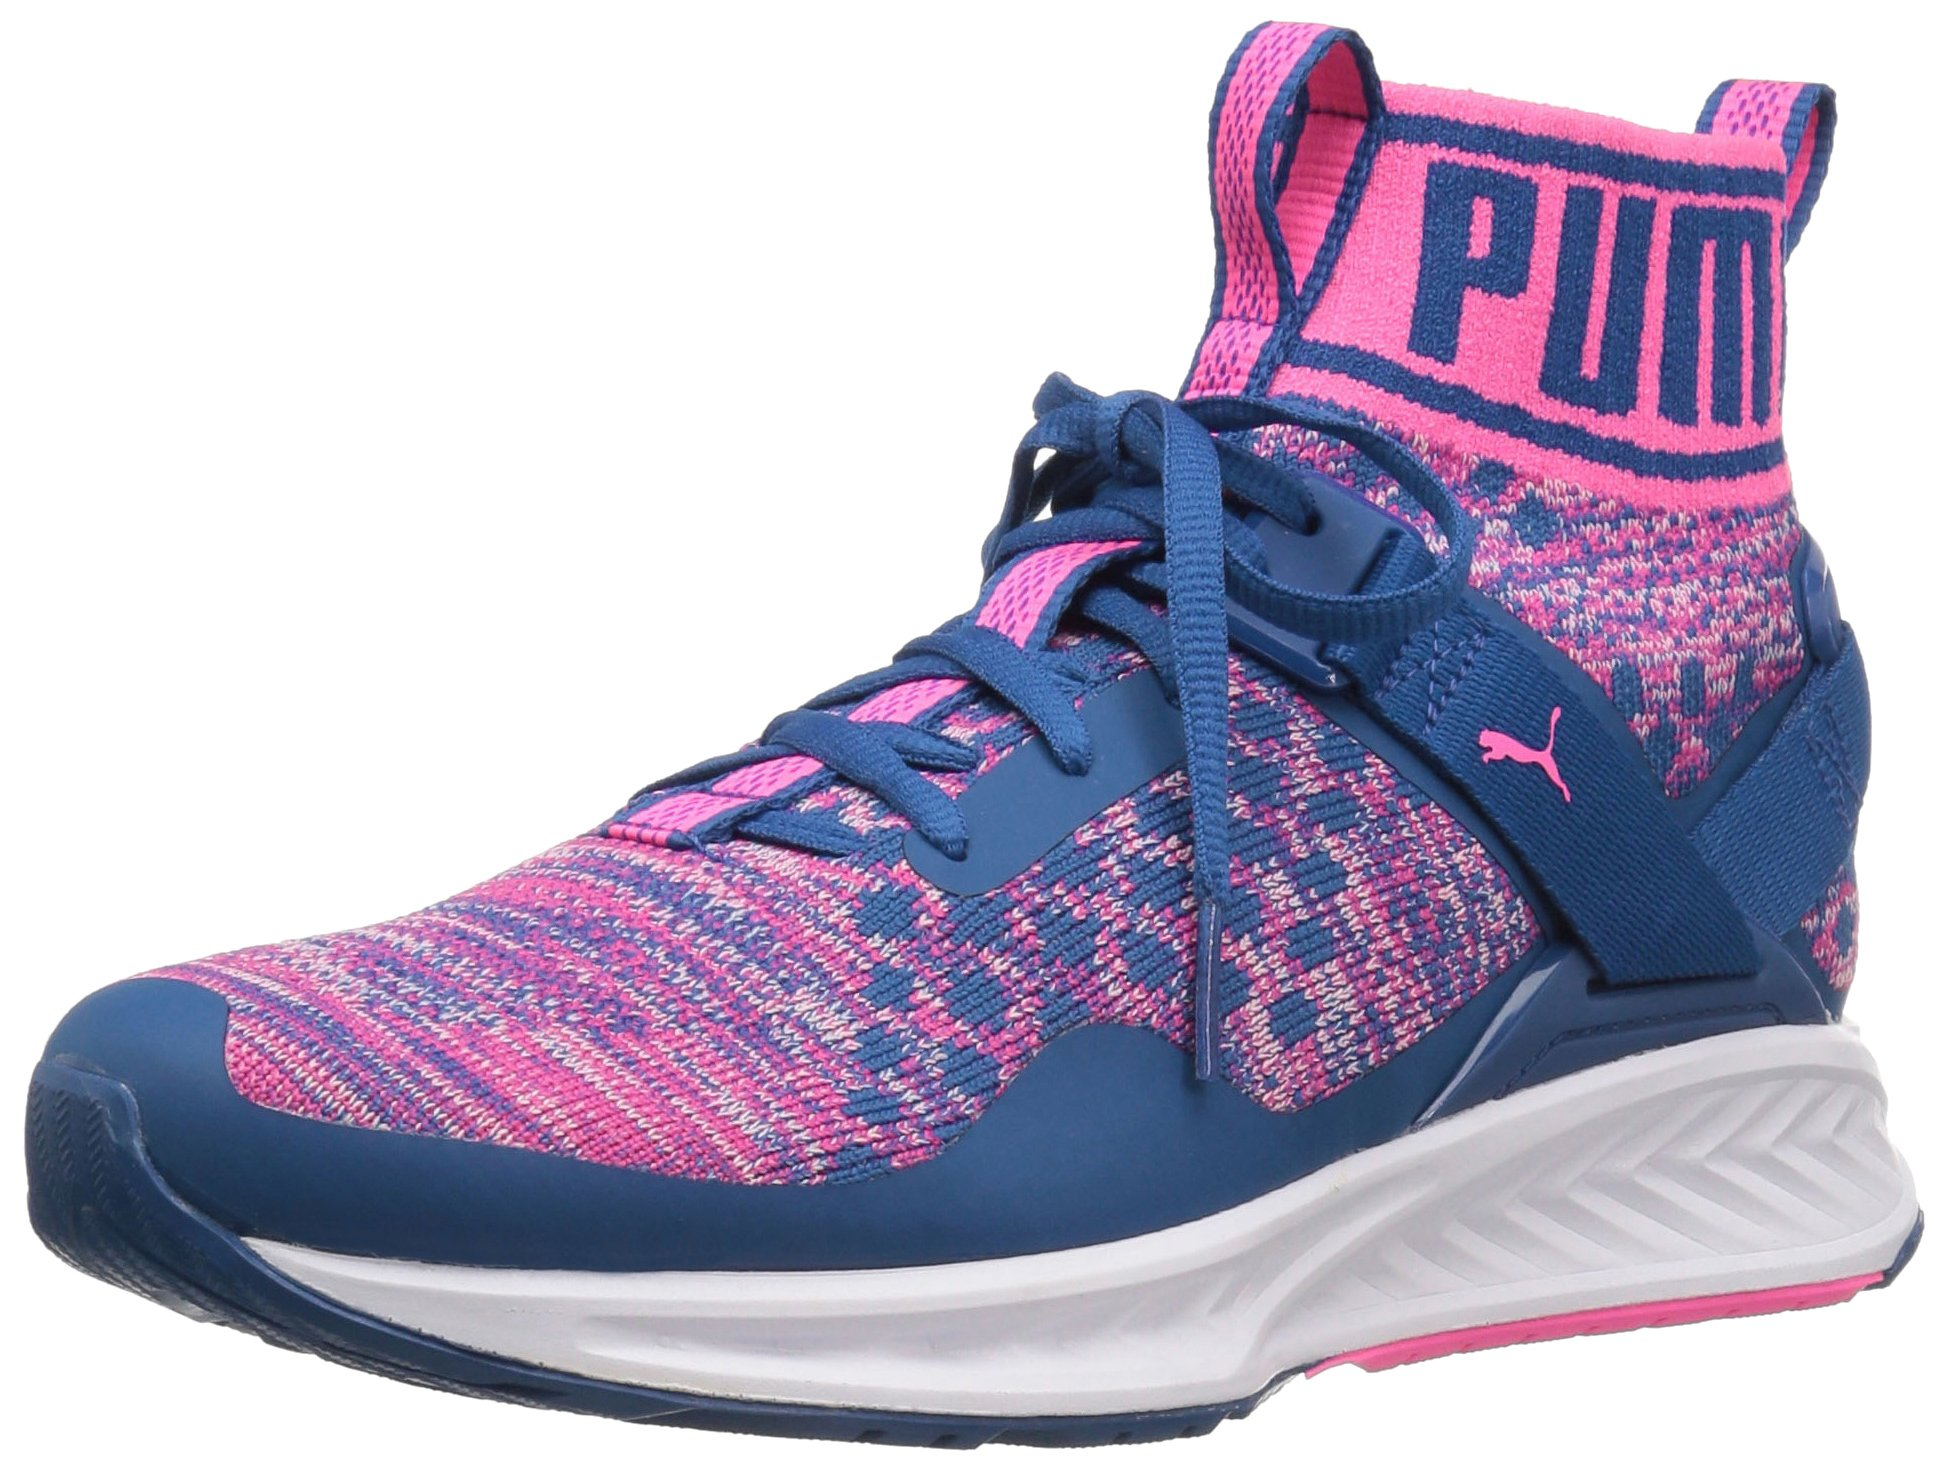 PUMA Women's Ignite Evoknit Wn's Cross-Trainer Shoe, True Blue-Knockout Pink White, 9.5 M US